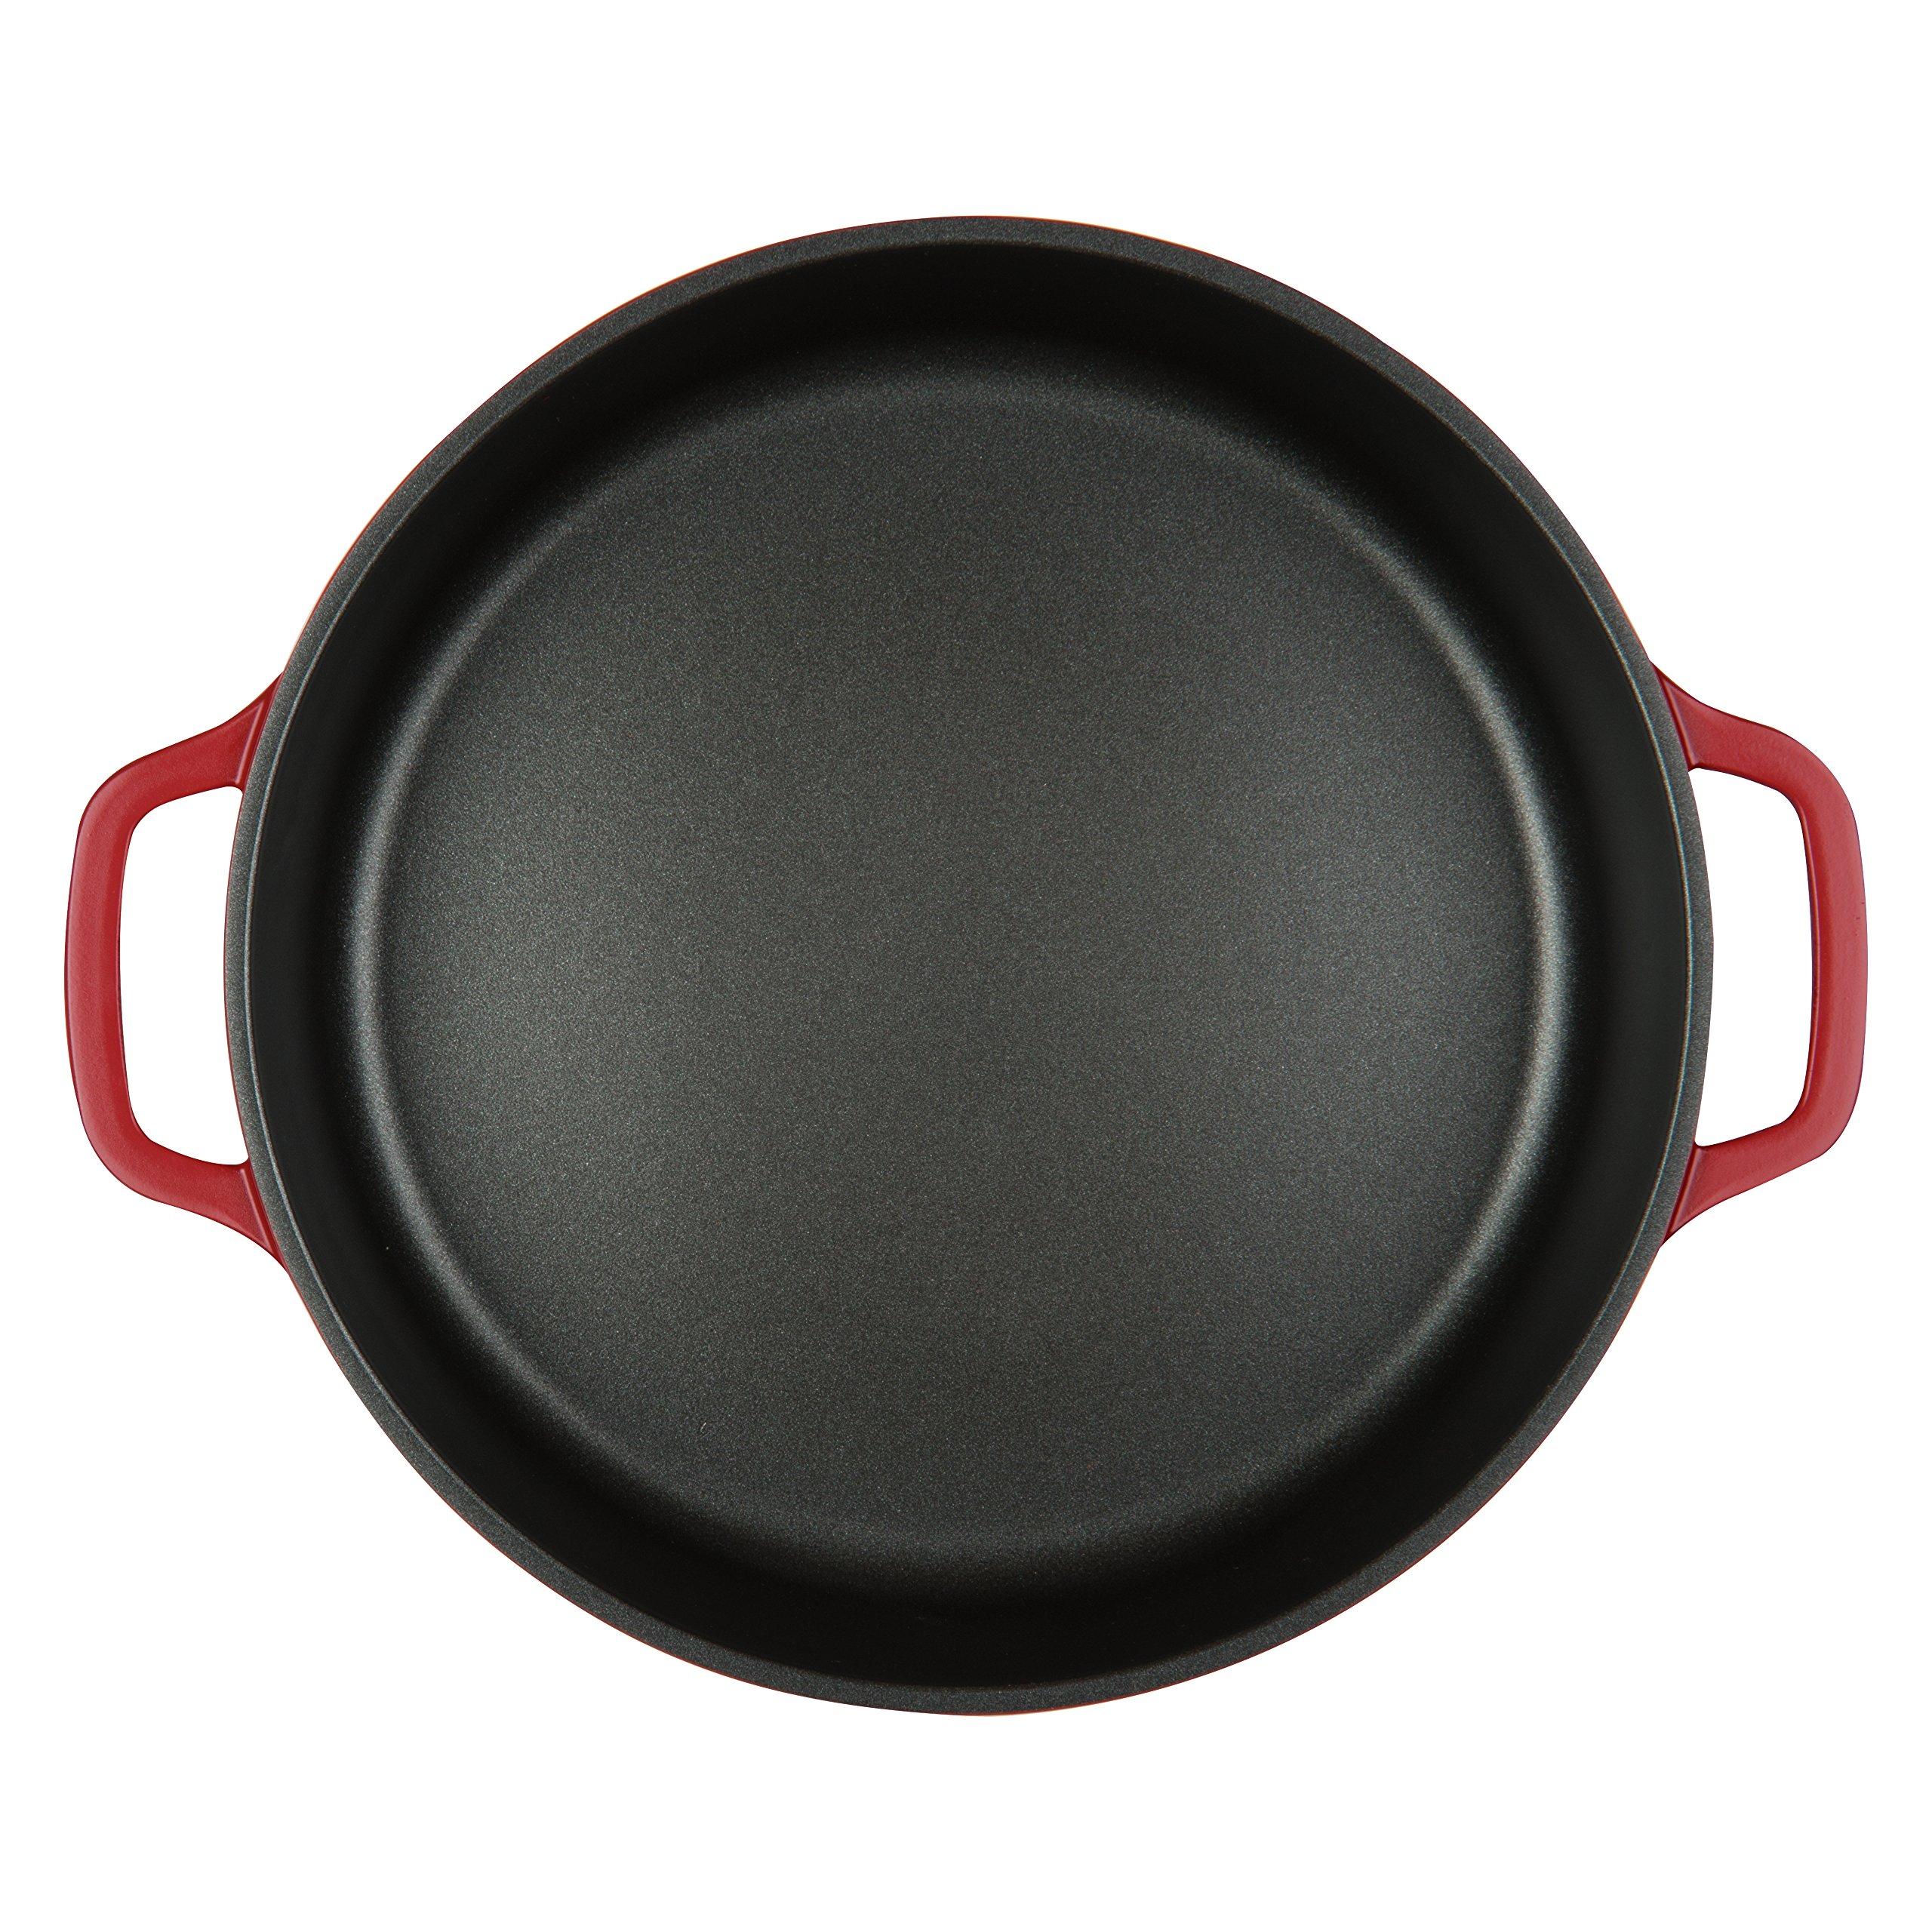 MasterPan 4QT Non-Stick Cast Aluminum Dutch Casserole, 11'', Red by Master Pan (Image #3)